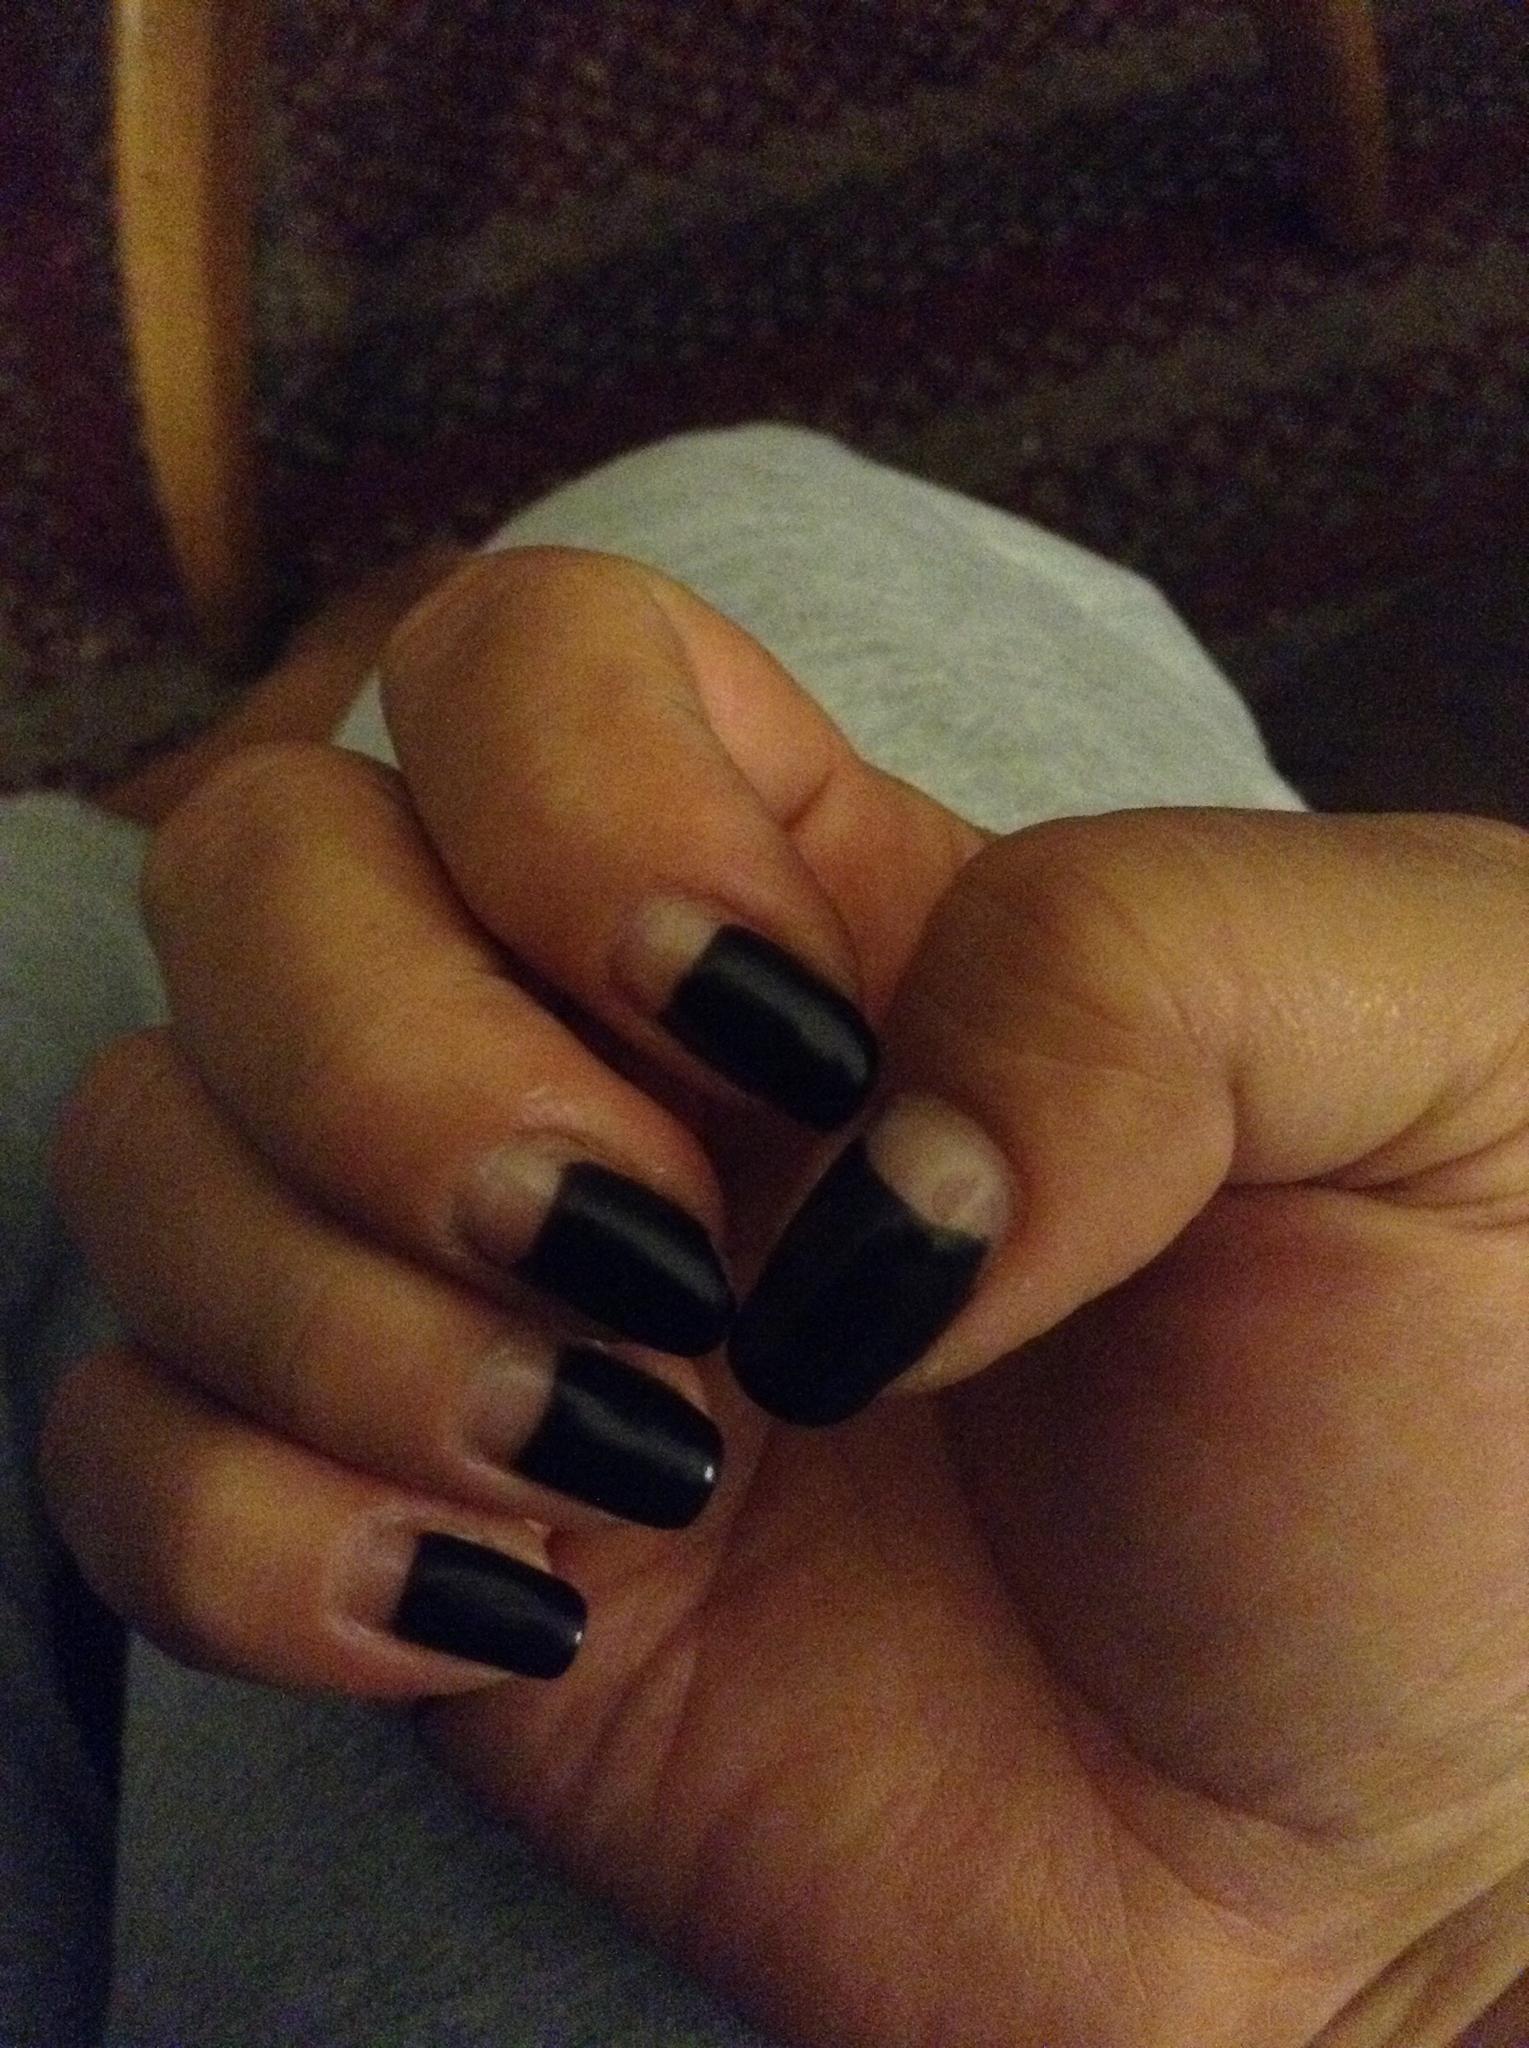 C T Nails 5 7605 Santa Monica Blvd, West Hollywood, CA 90046 - YP.com